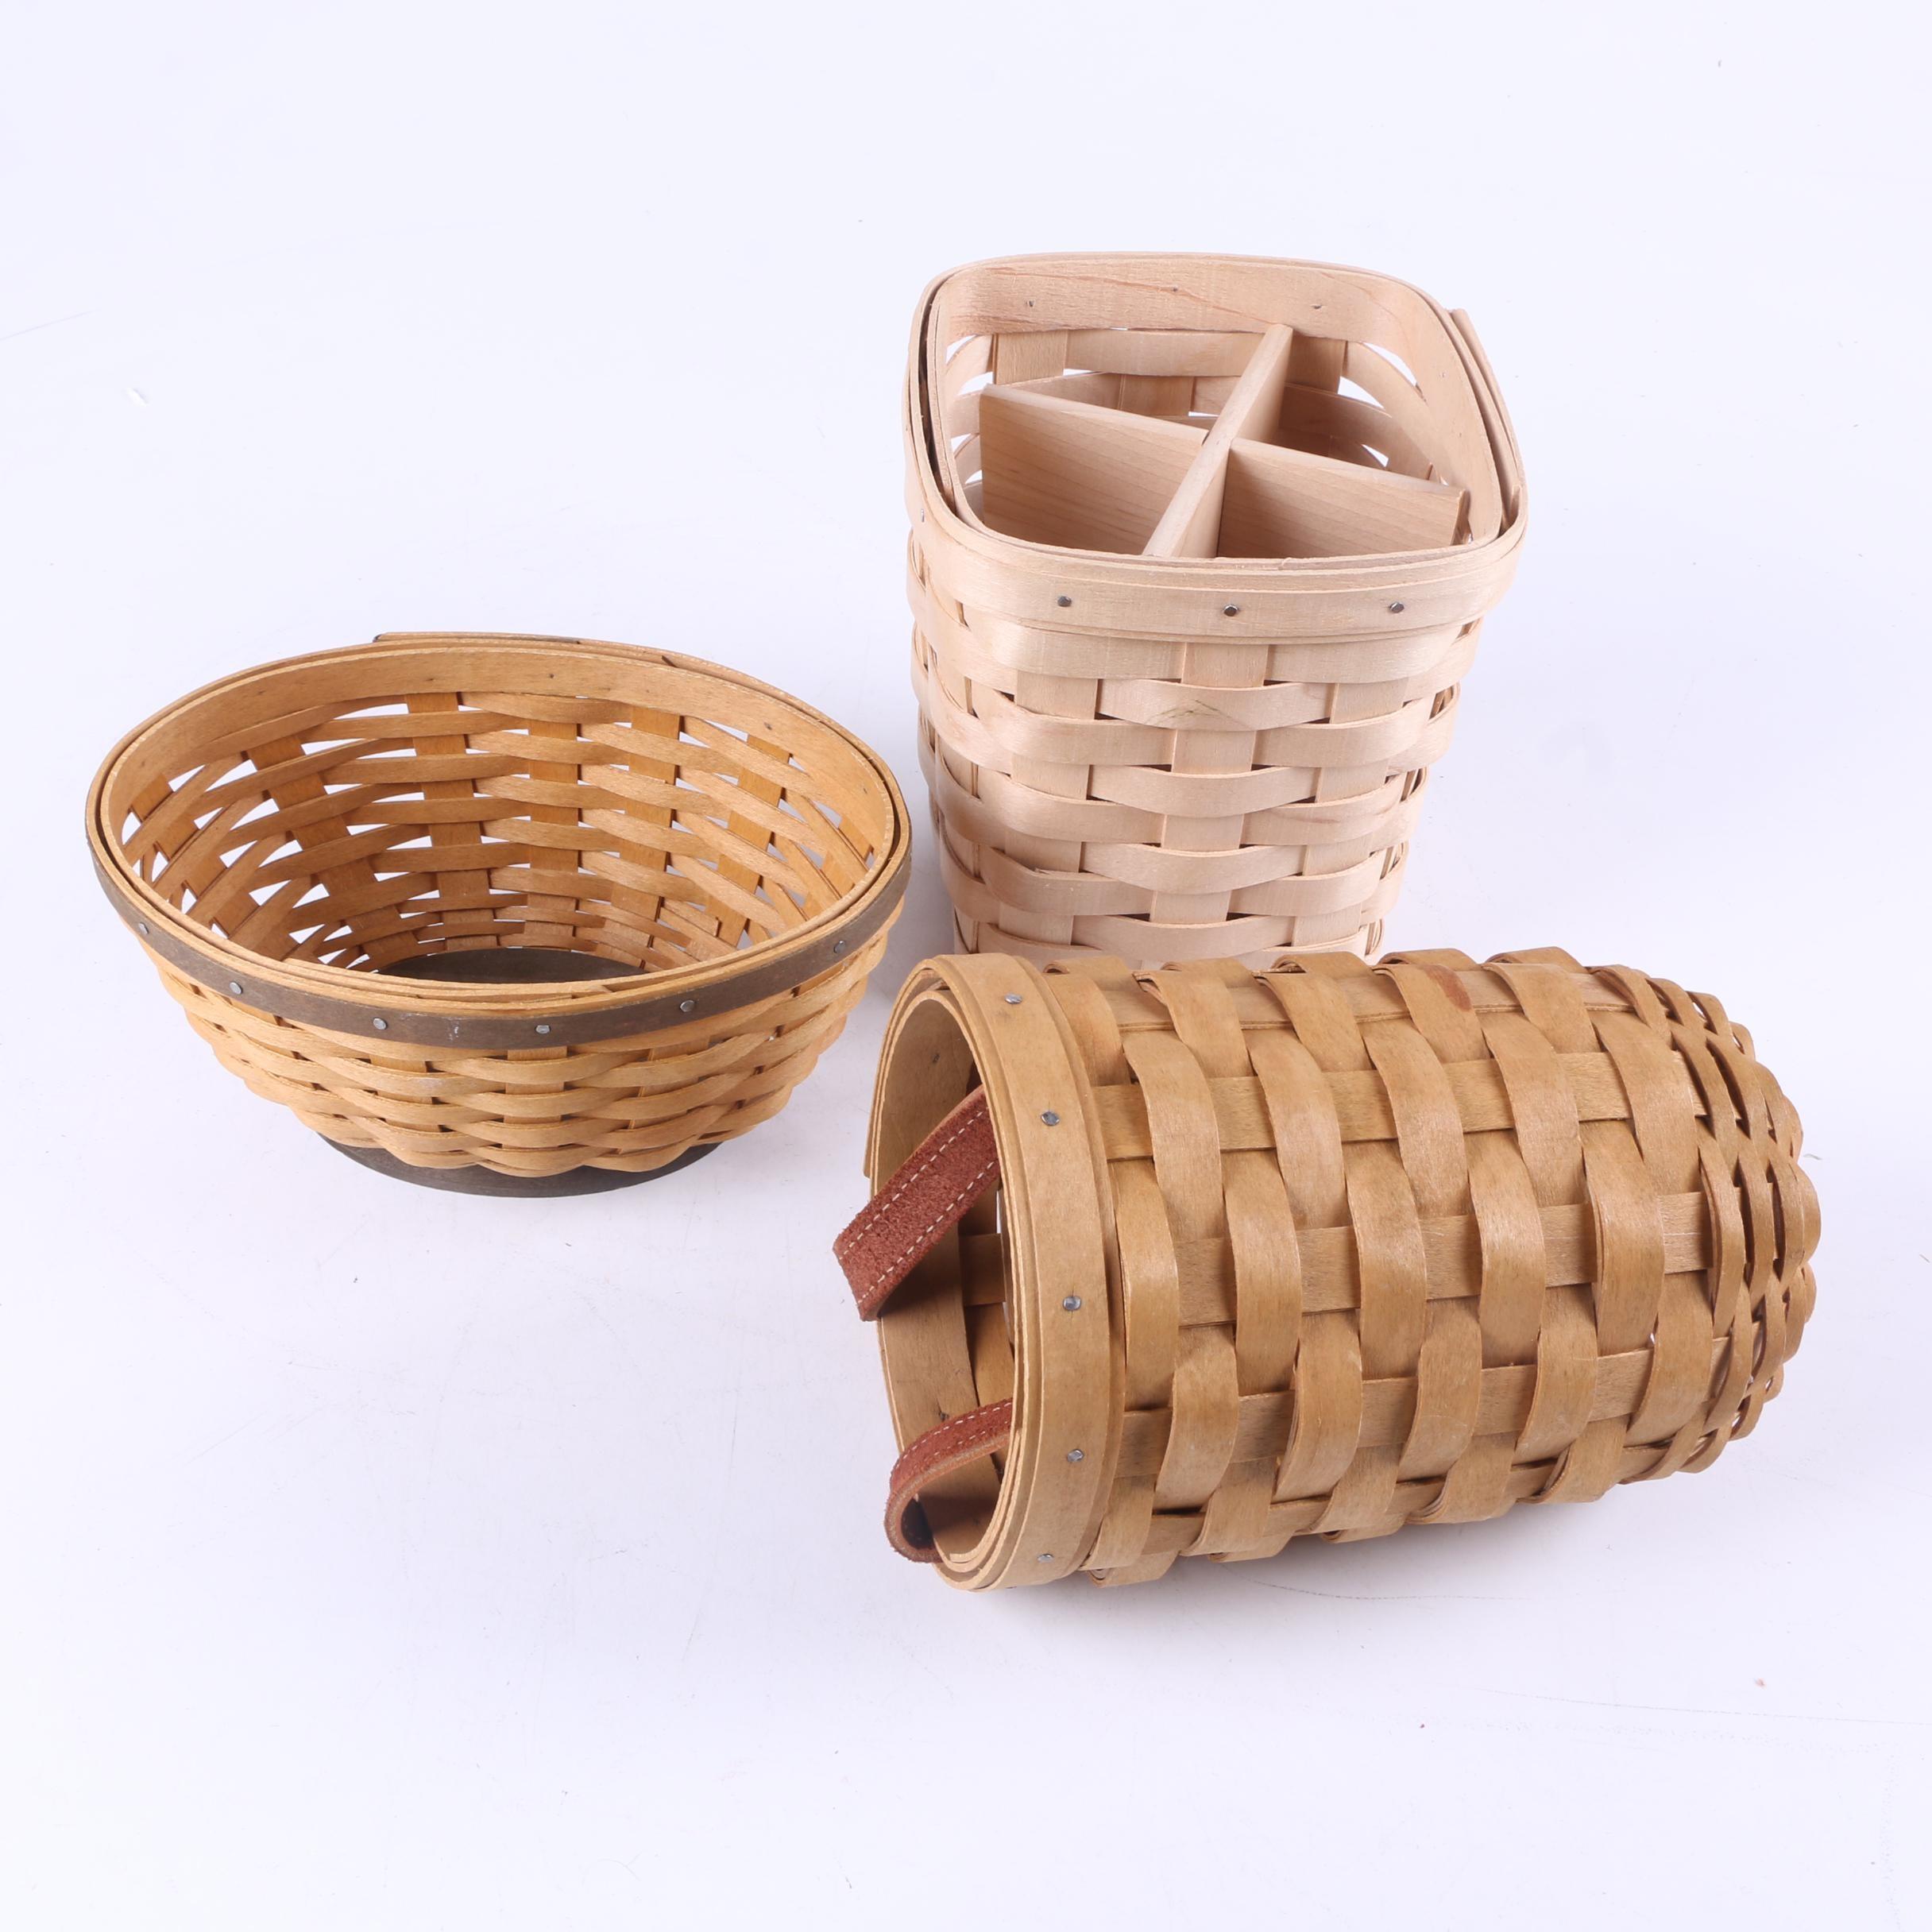 Longaberger Woven Baskets